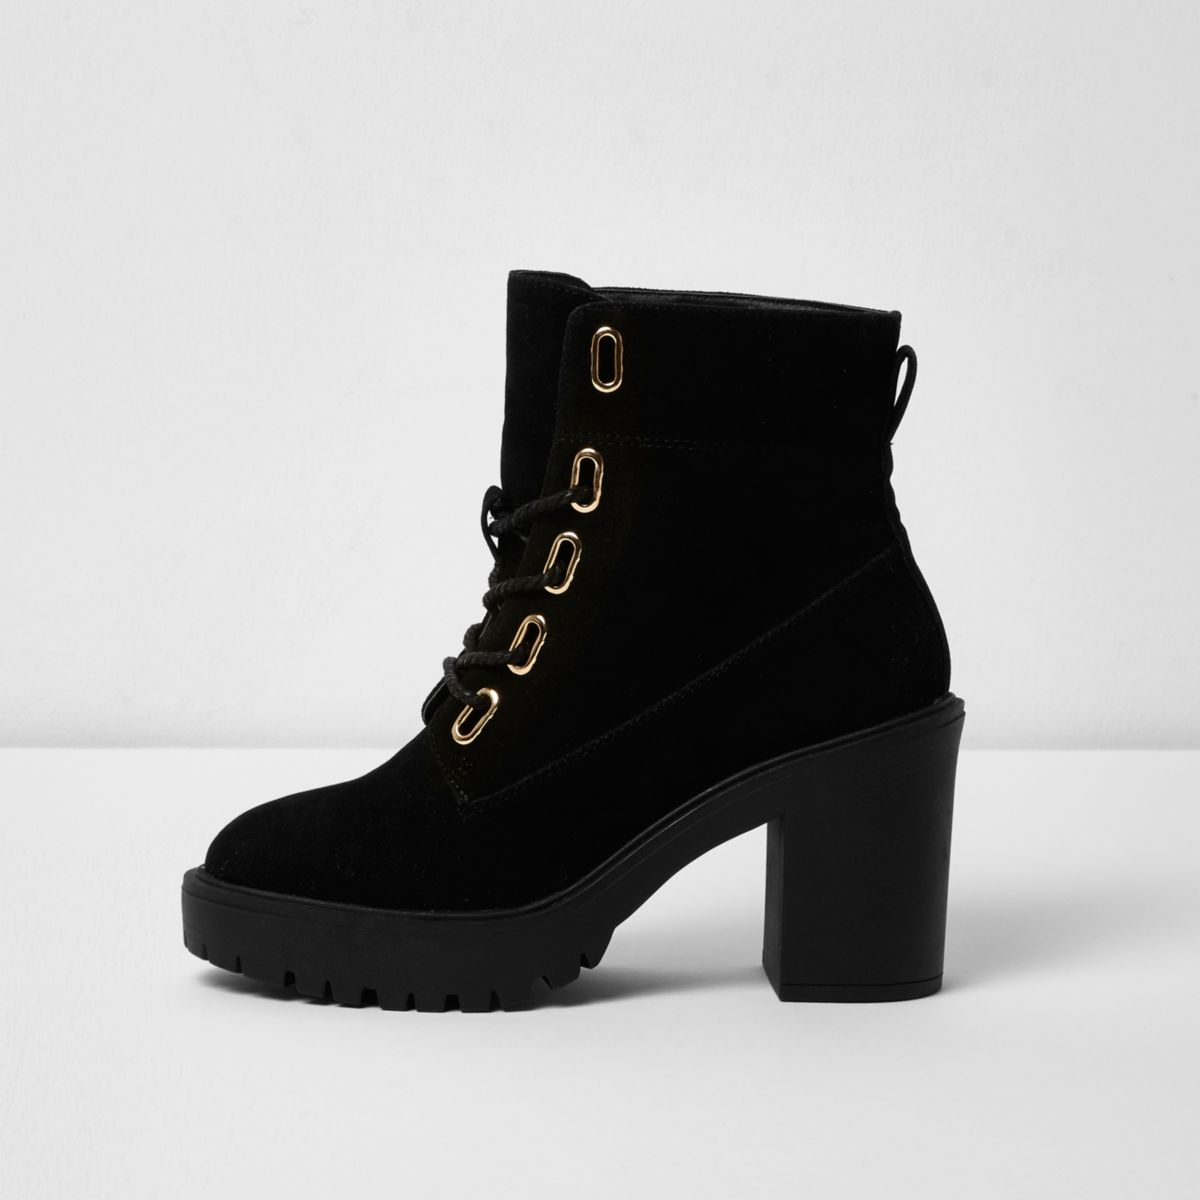 River Island Shoe Boots Sale